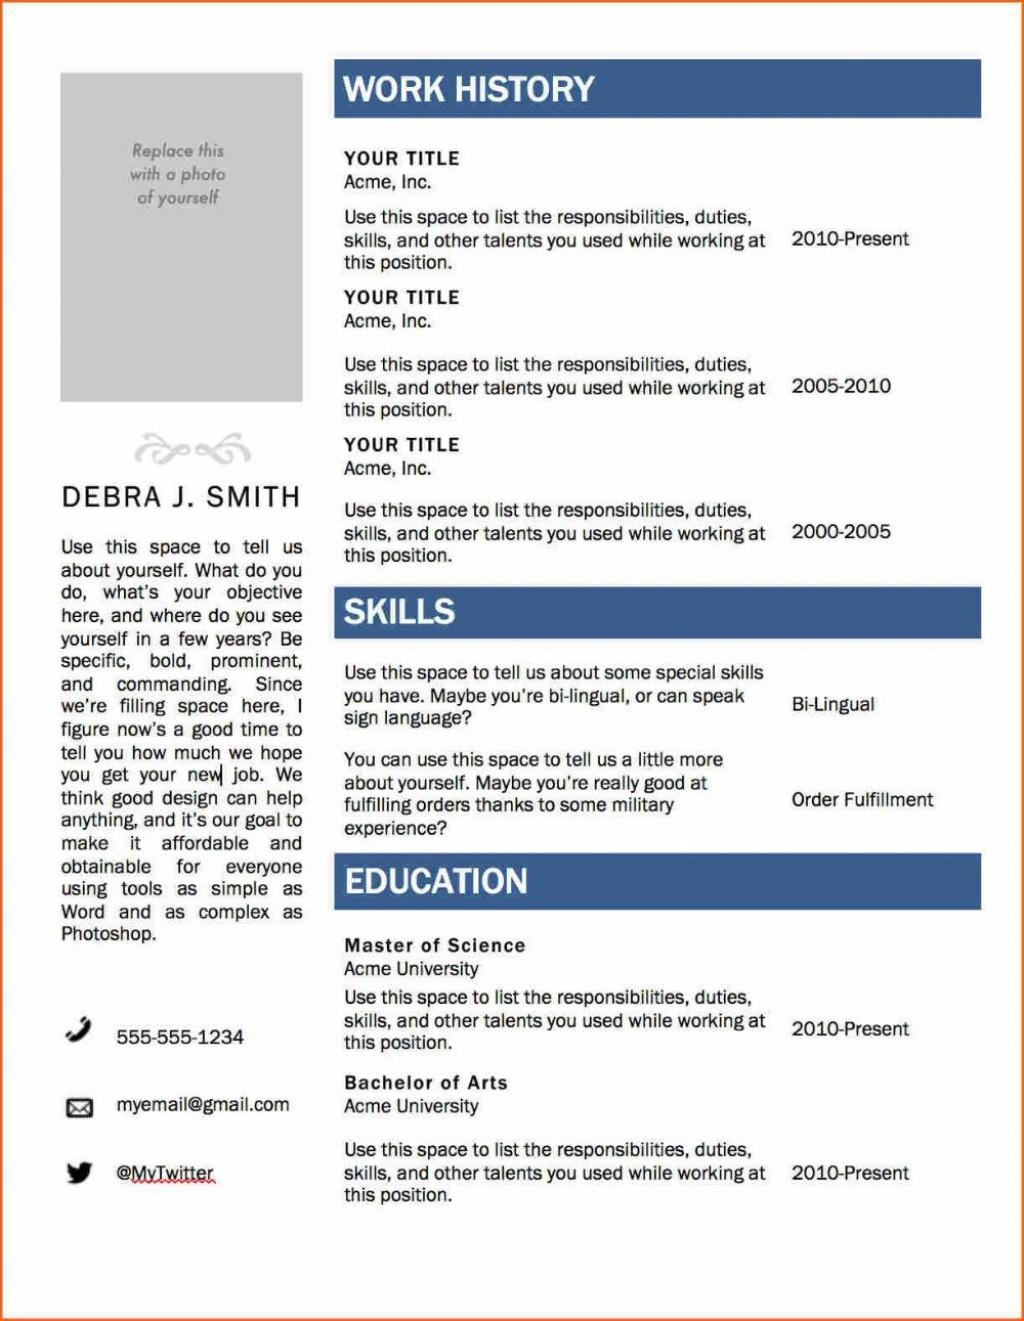 002 Frightening M Word 2010 Resume Template Idea  Templates Office Free Microsoft DownloadLarge